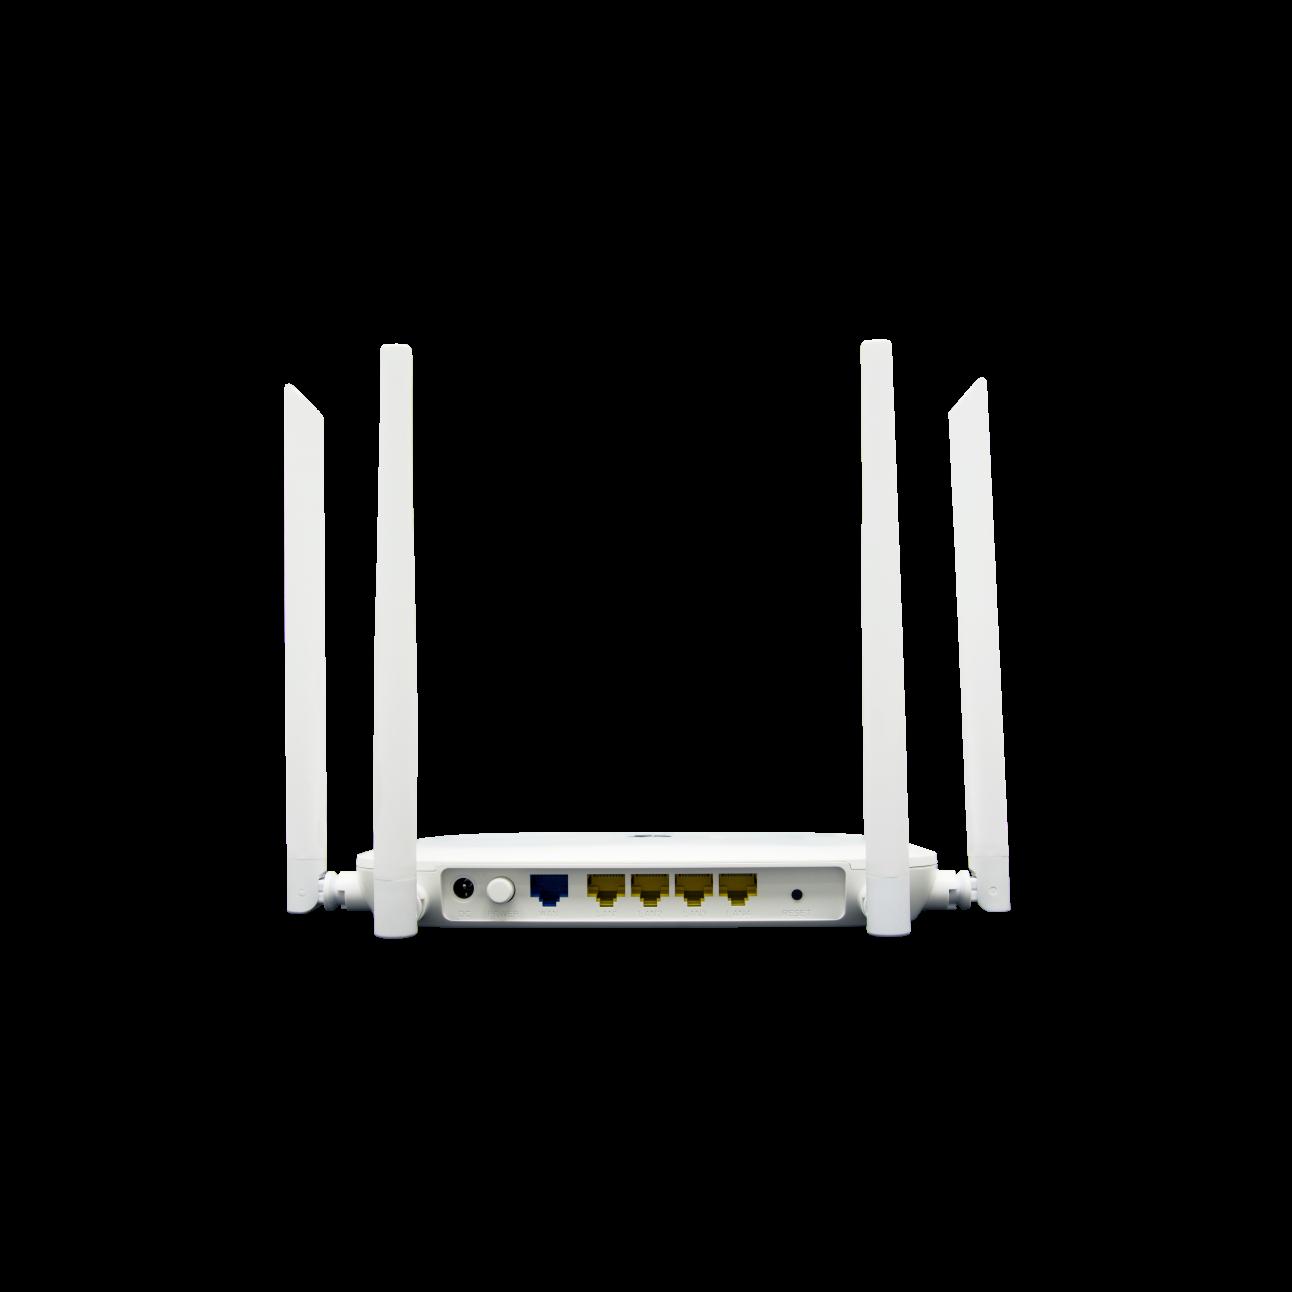 Беспроводной маршрутизатор SNR-CPE-ME2-Lite, 802.11a/b/g/n, 802.11ac Wave 2, 5xGE RJ45